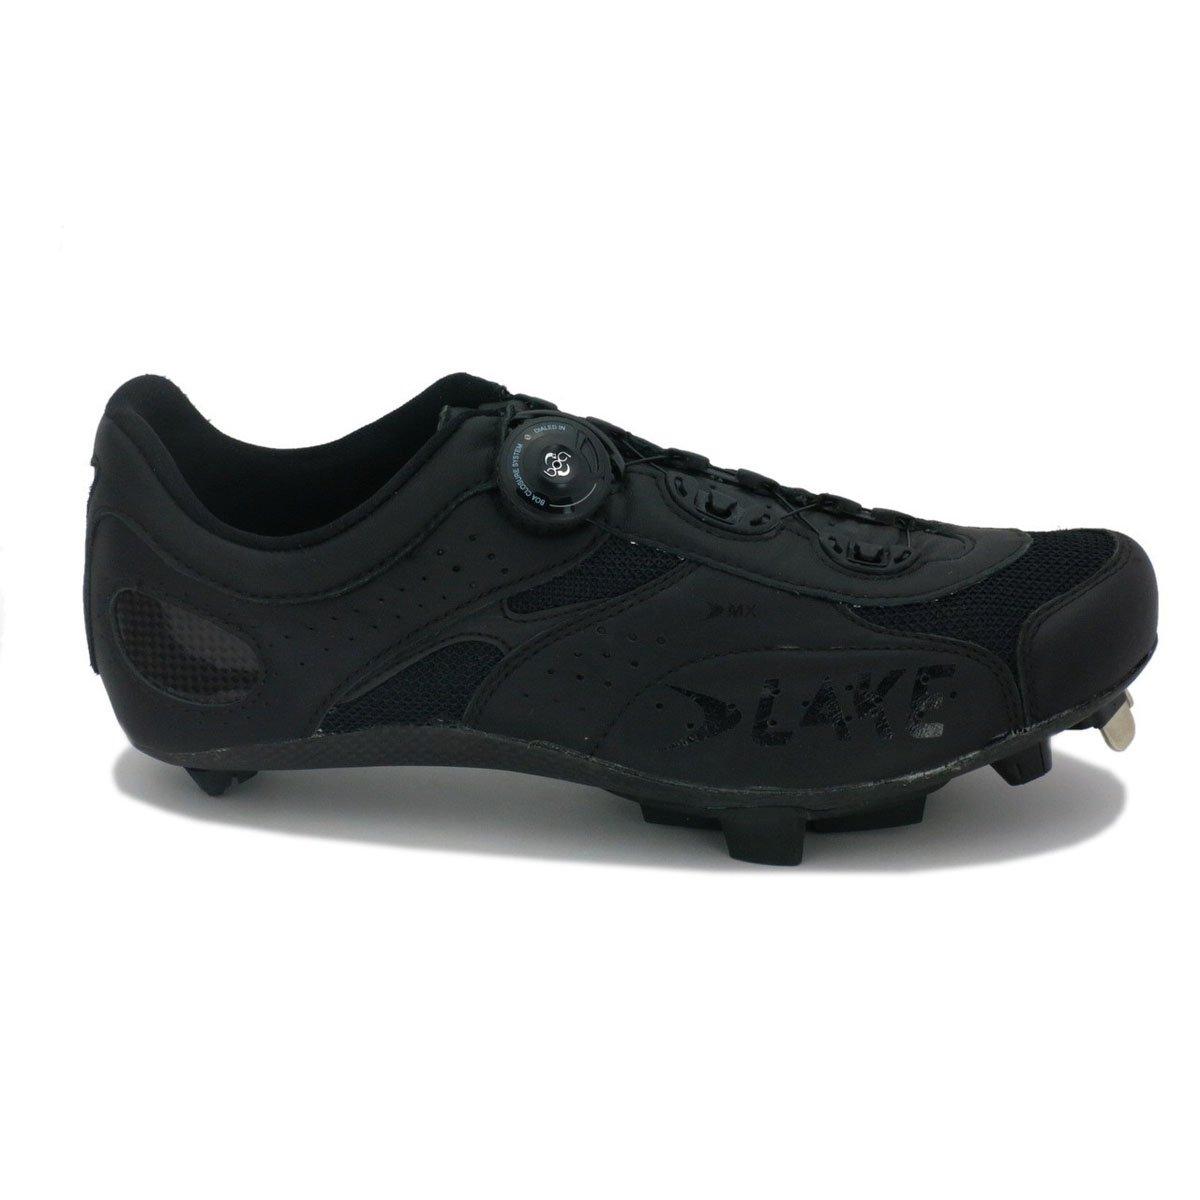 Lake mx331 Shoes – Men 's B00OTU1FRY 40 EU|ブラック ブラック 40 EU